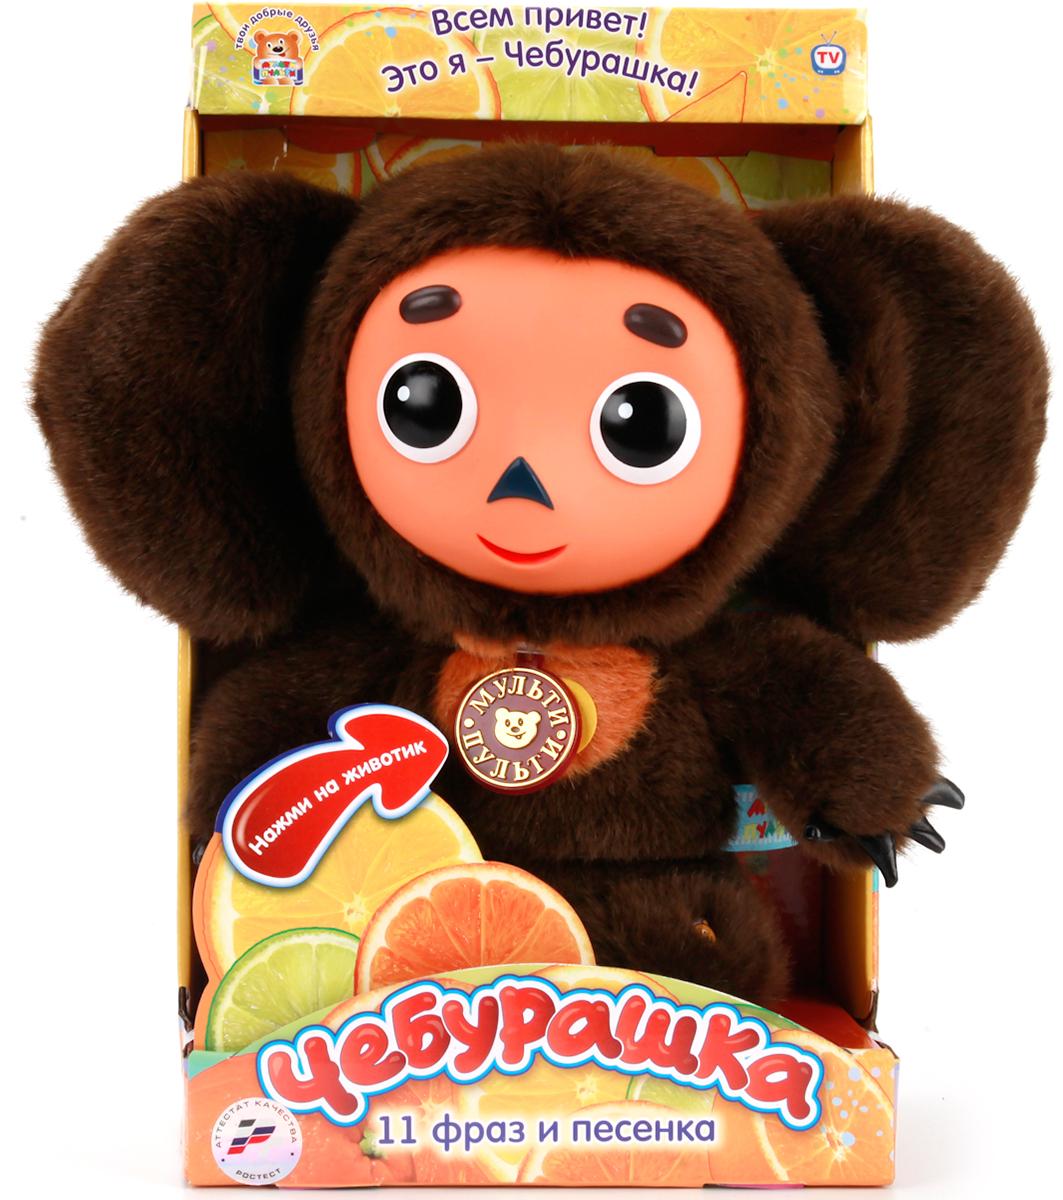 Мульти-Пульти Мягкая игрушка Чебурашка 25 см мульти пульти мягкая игрушка принцесса луна 18 см со звуком my little pony мульти пульти